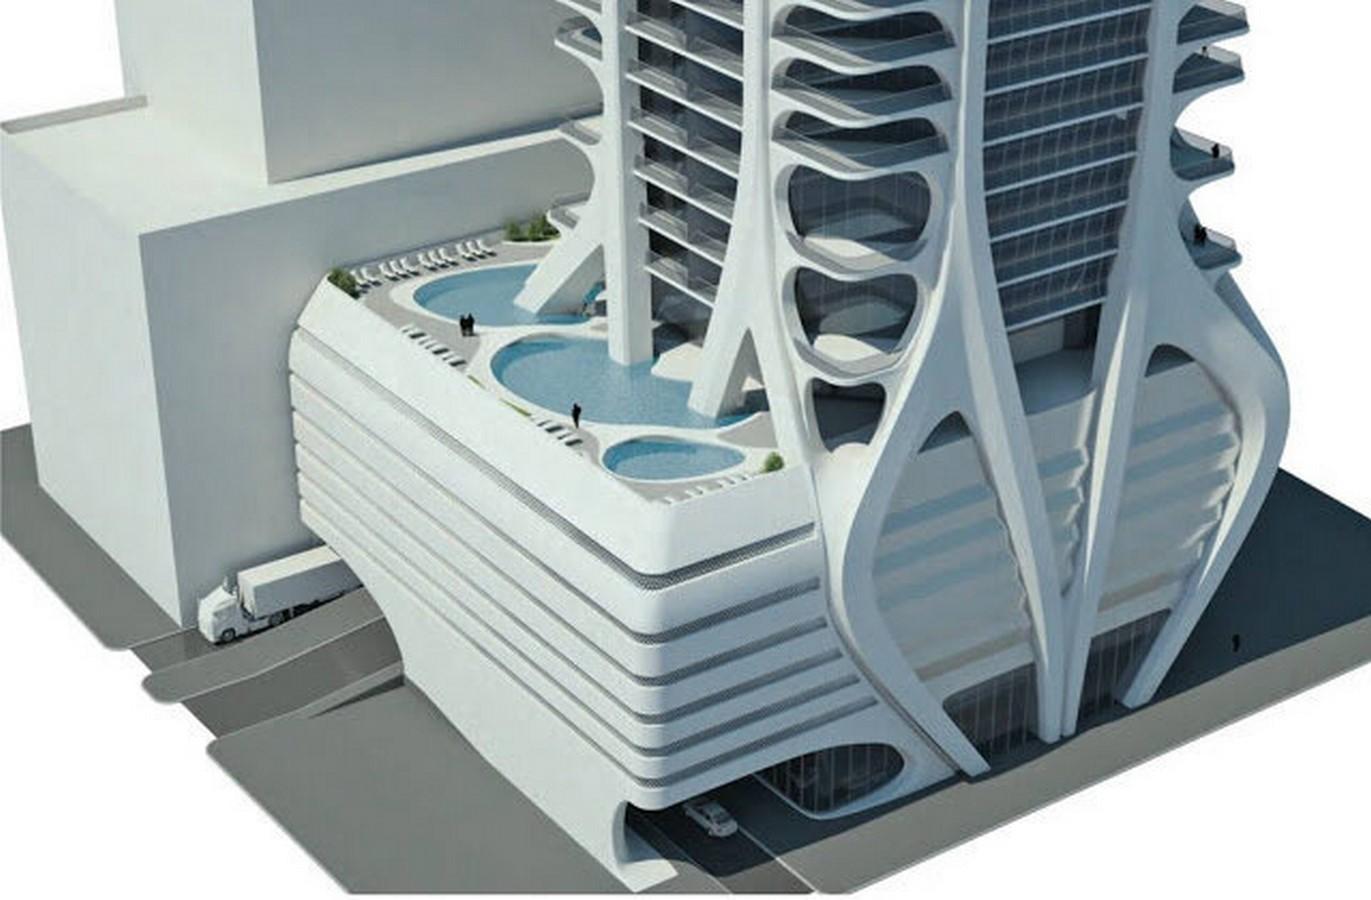 One Thousand Museum by Zaha Hadid: The luxurious condominium of Miami - Sheet5